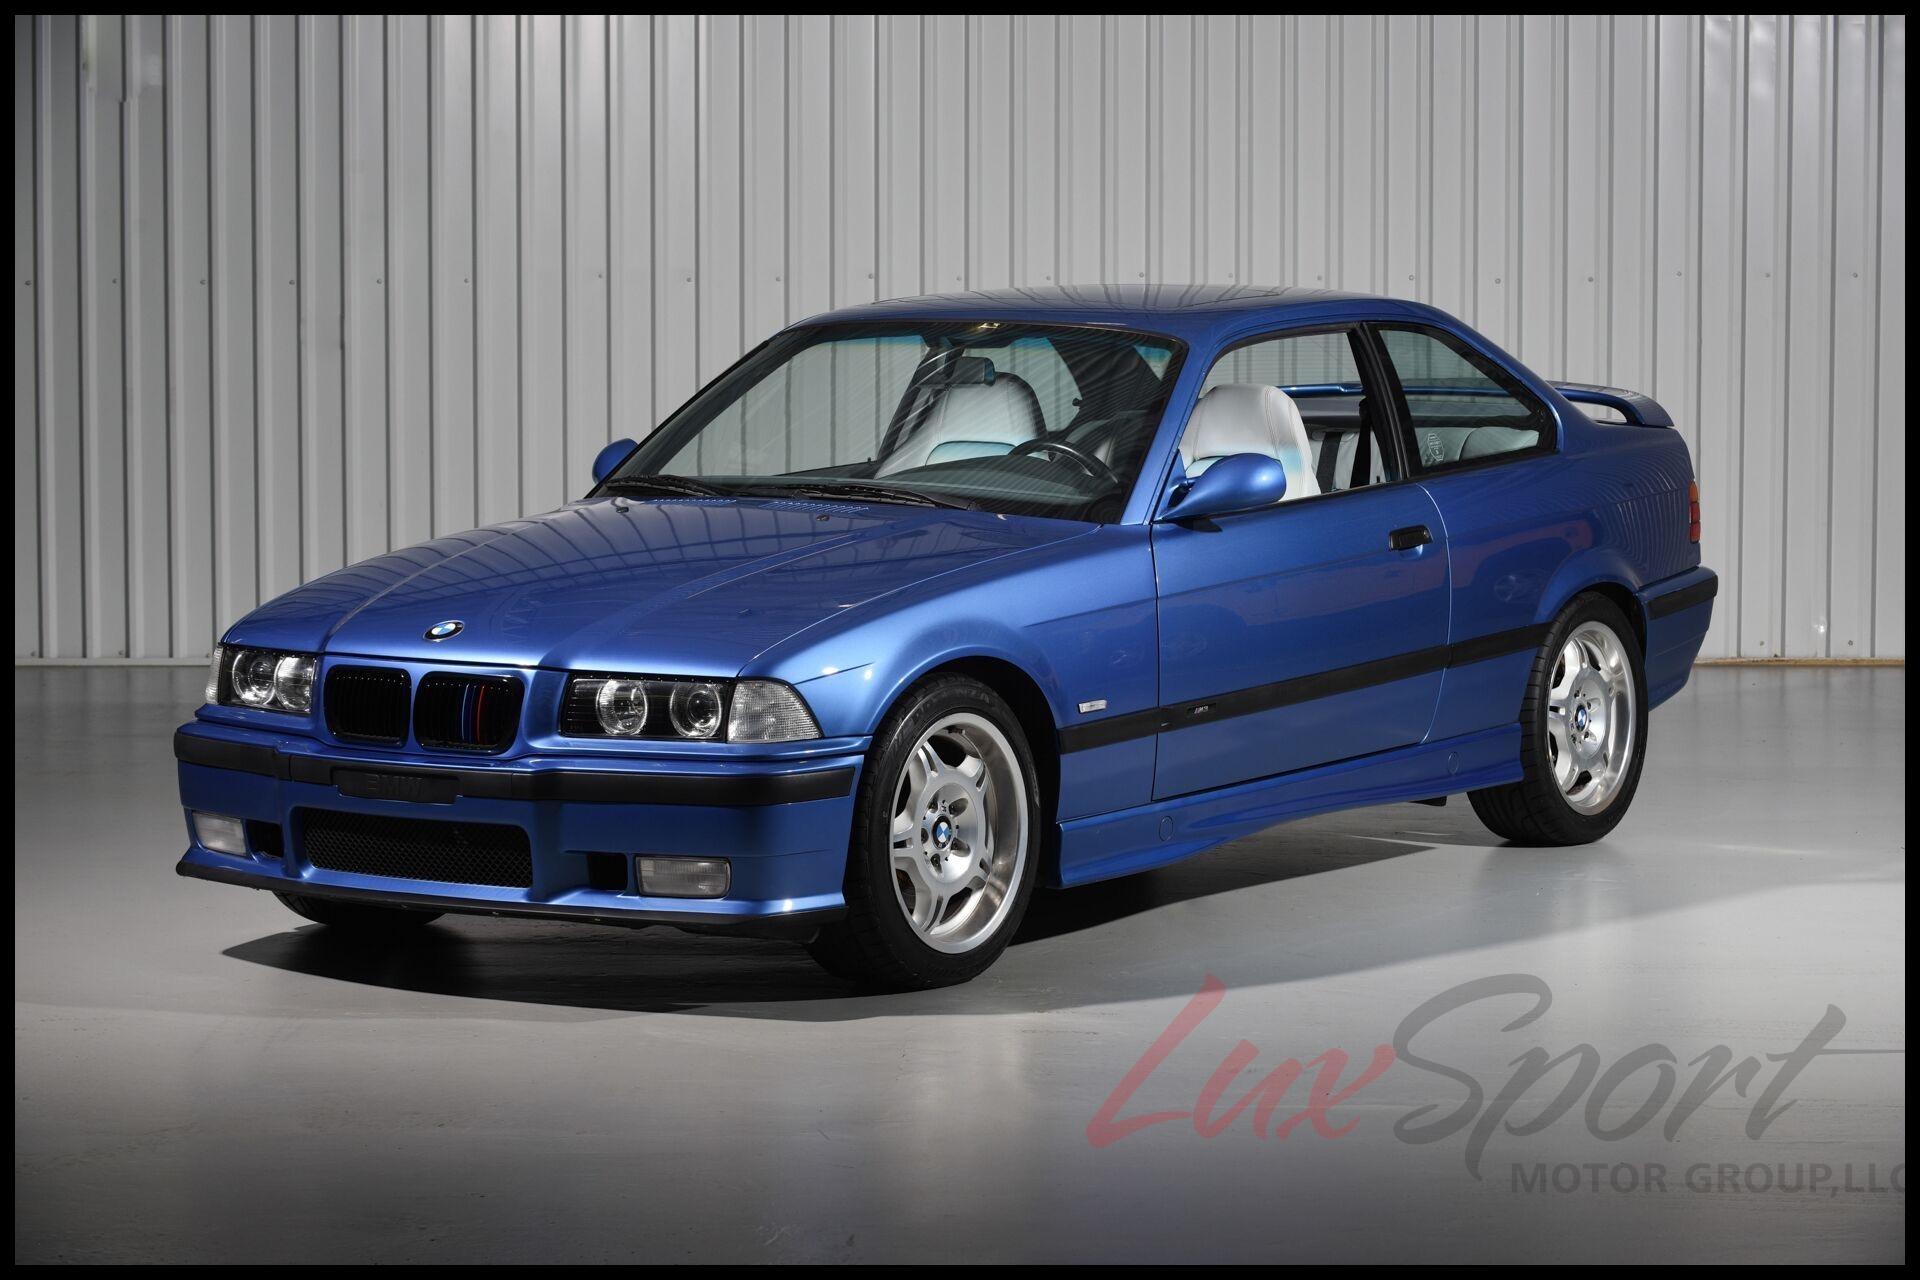 Used 1997 BMW E36 M3 Coupe